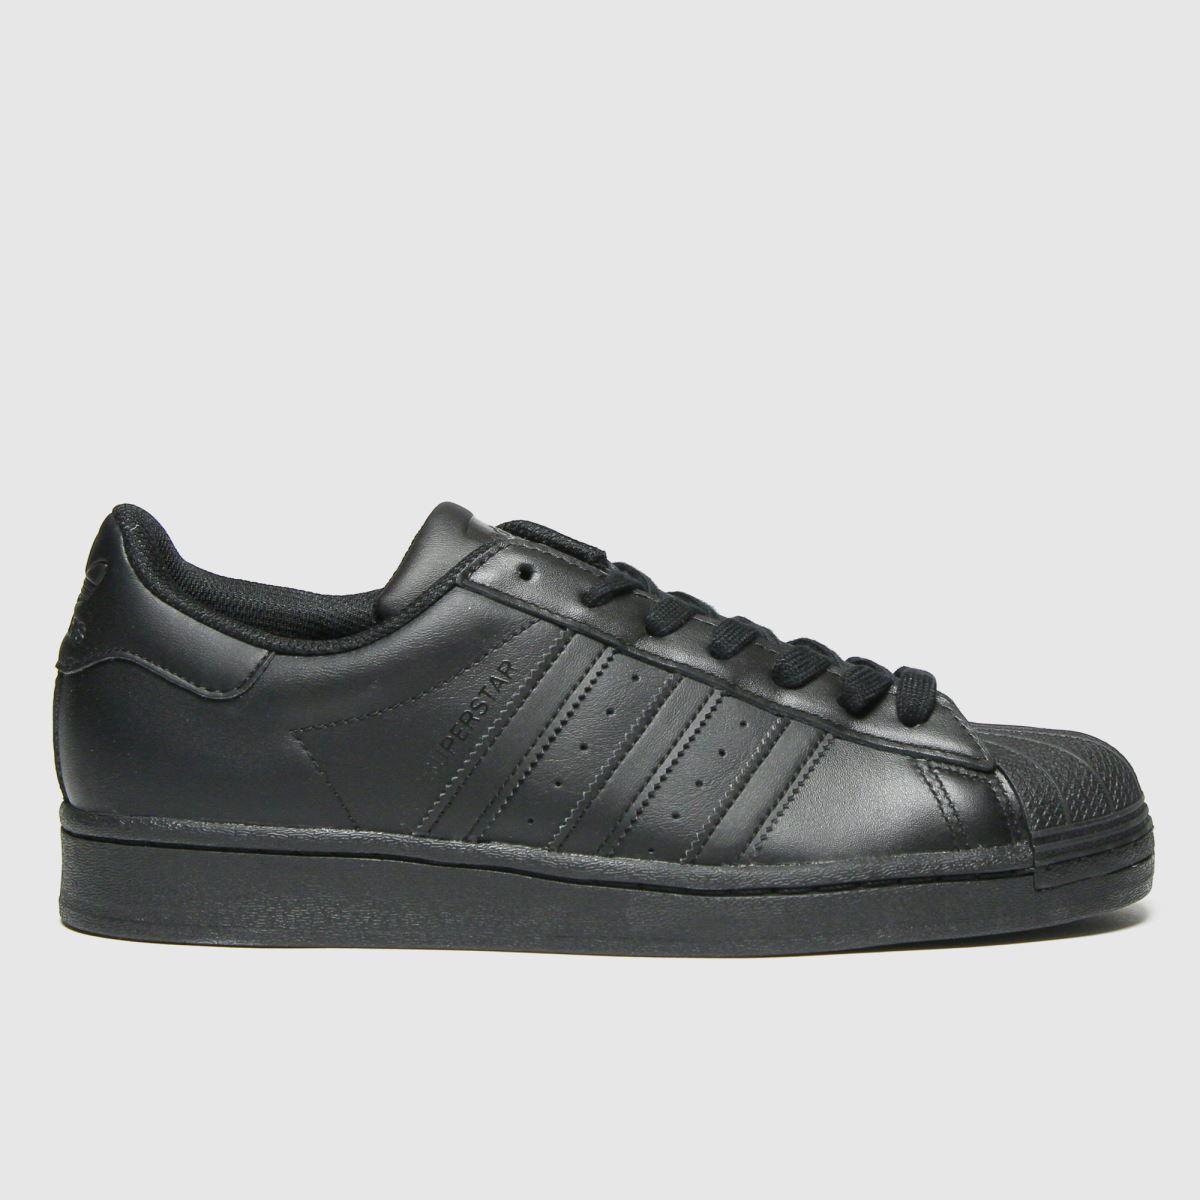 Adidas Black Superstar Trainers